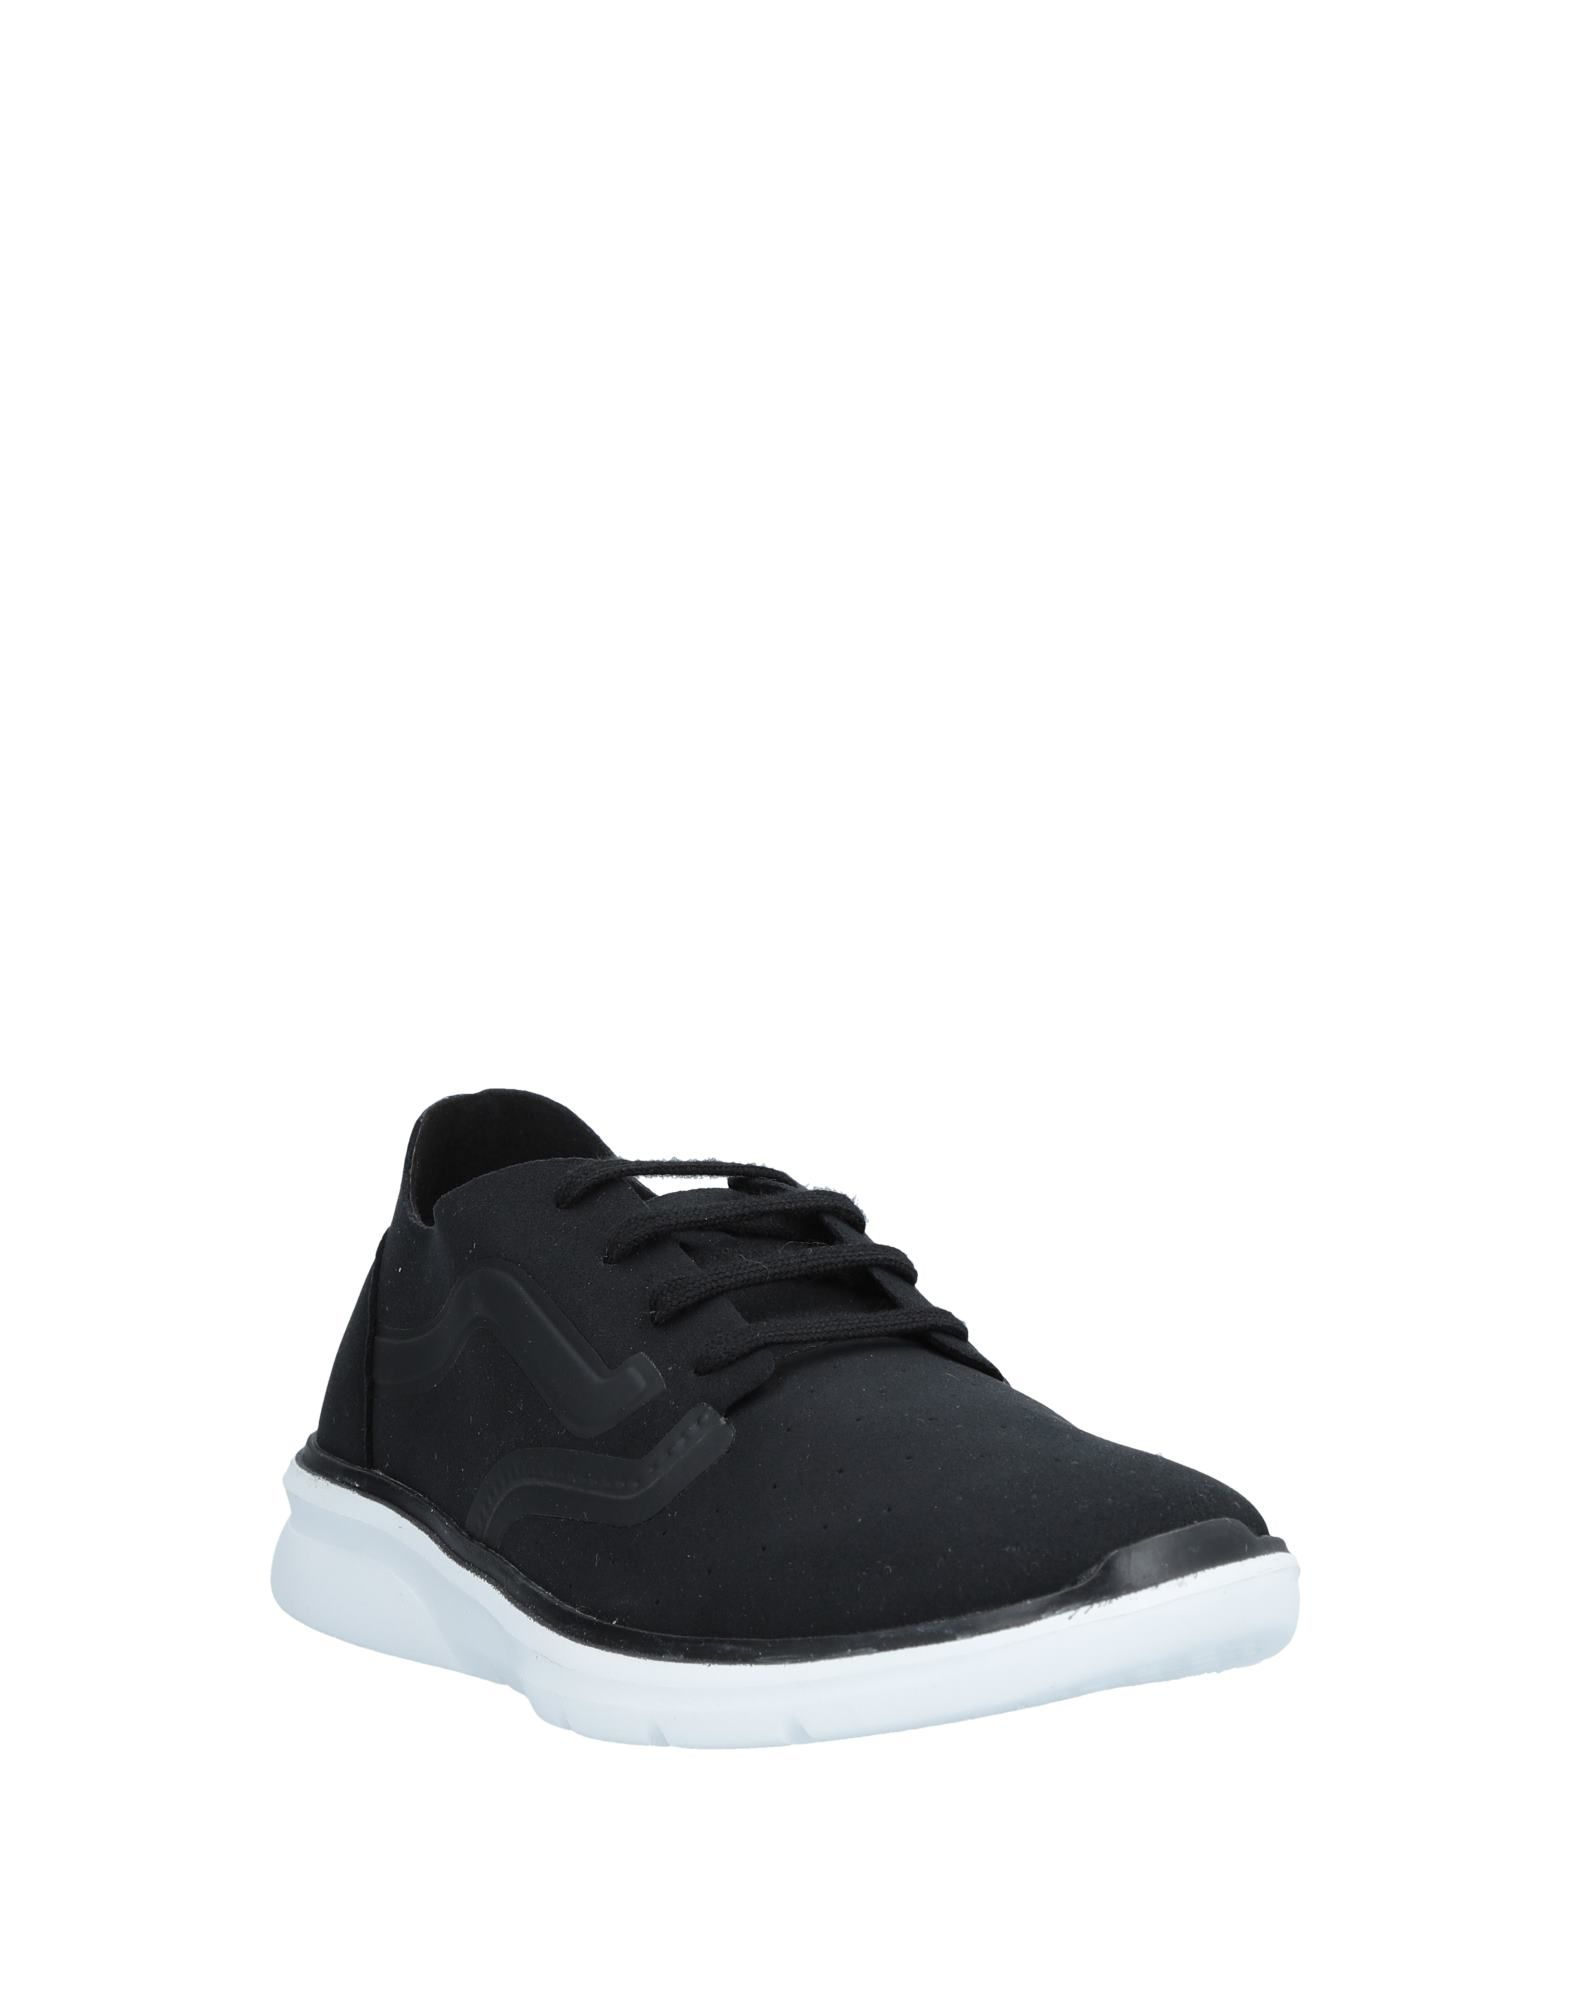 Vans Sneakers beliebte Damen  11534717JS Gute Qualität beliebte Sneakers Schuhe 4021d8